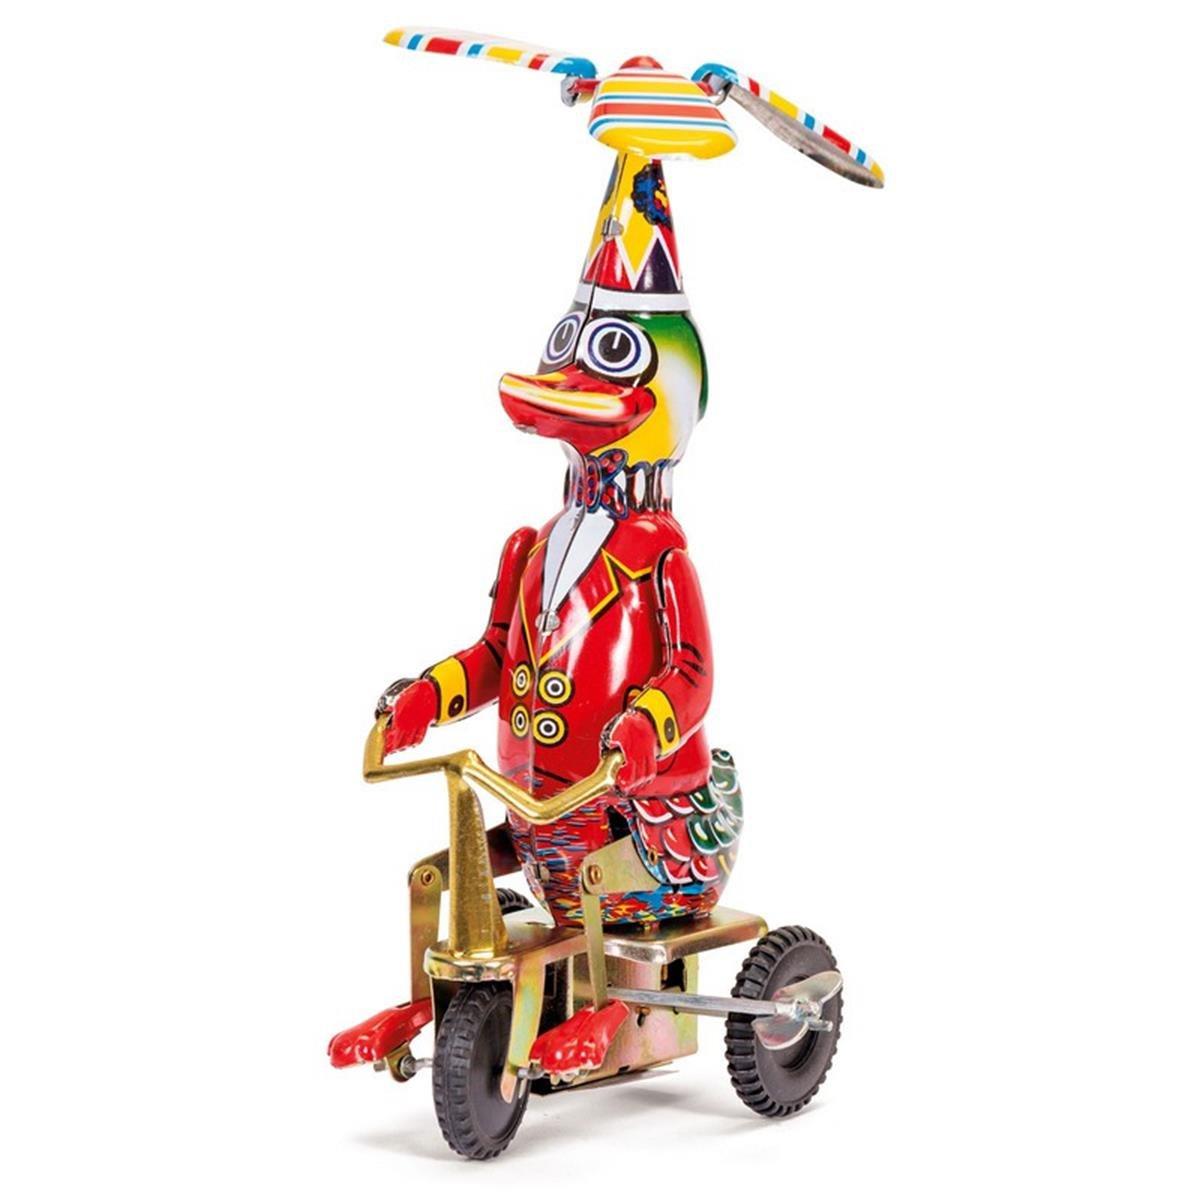 Childrens Fun Play Tin Duck On Bike Detailed Clockwork Mechanism Kids Toy by Tobar